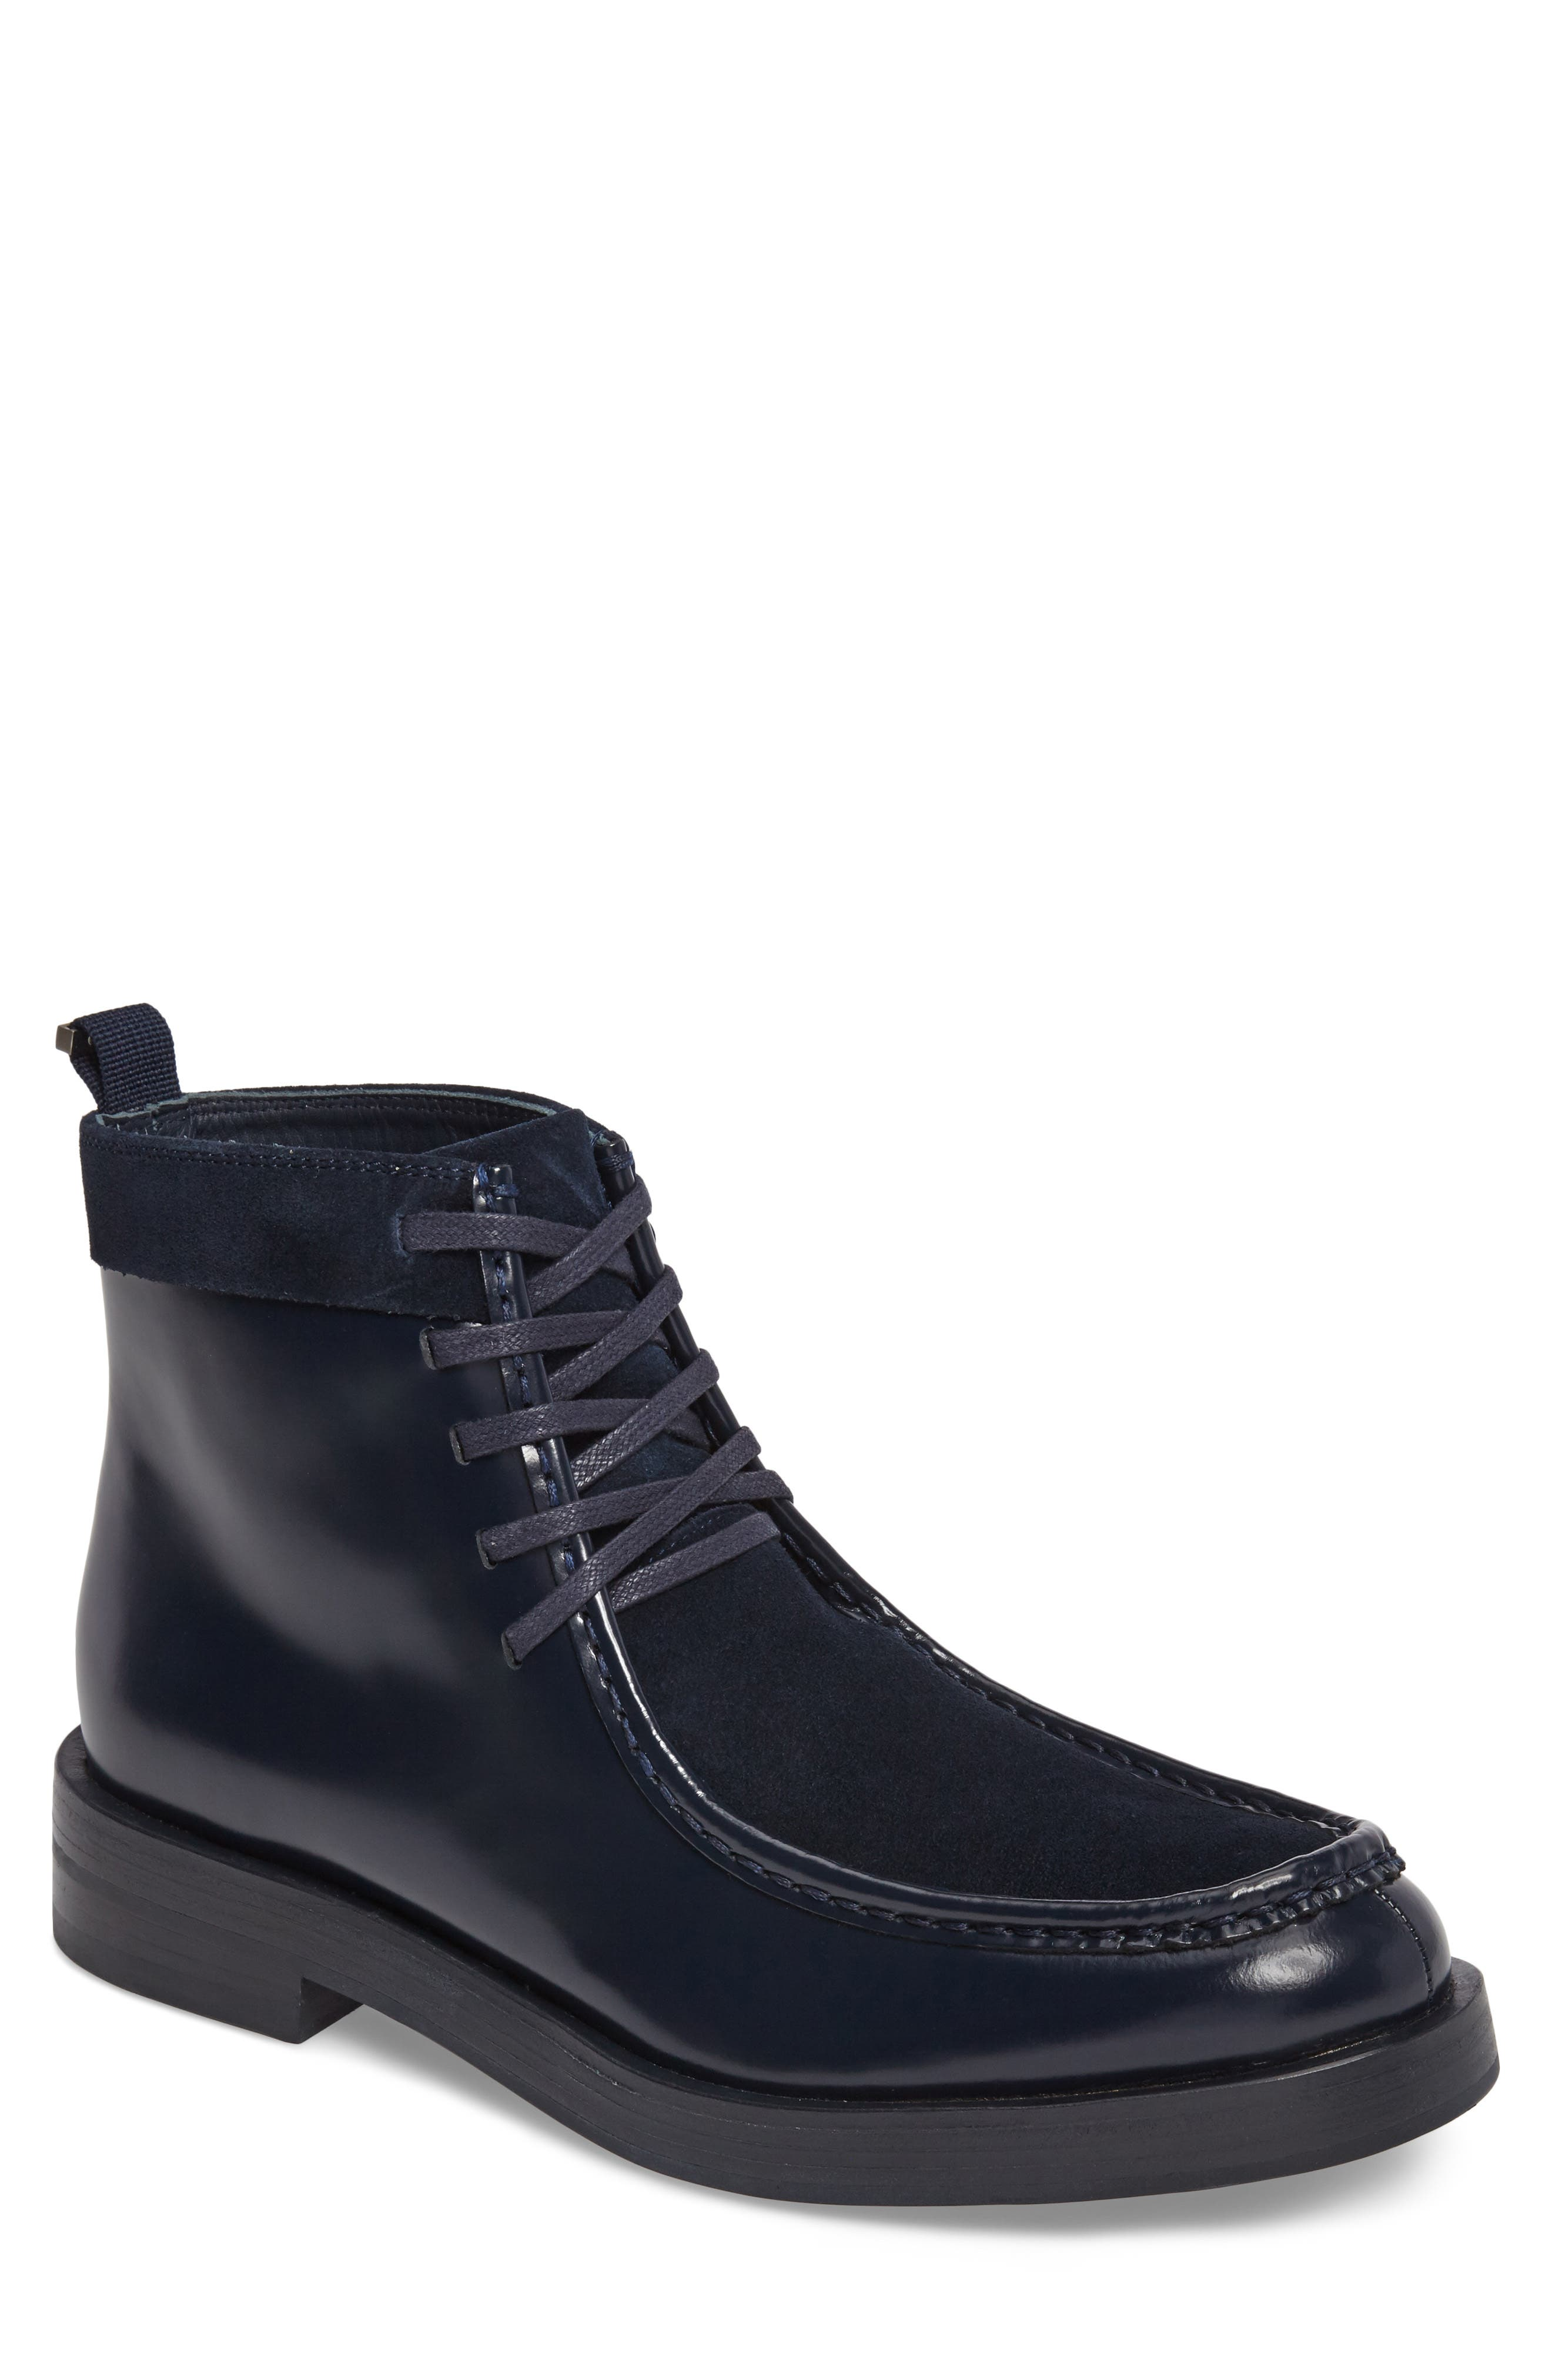 Rafi Moc Toe Boot,                         Main,                         color, Dark Navy Leather